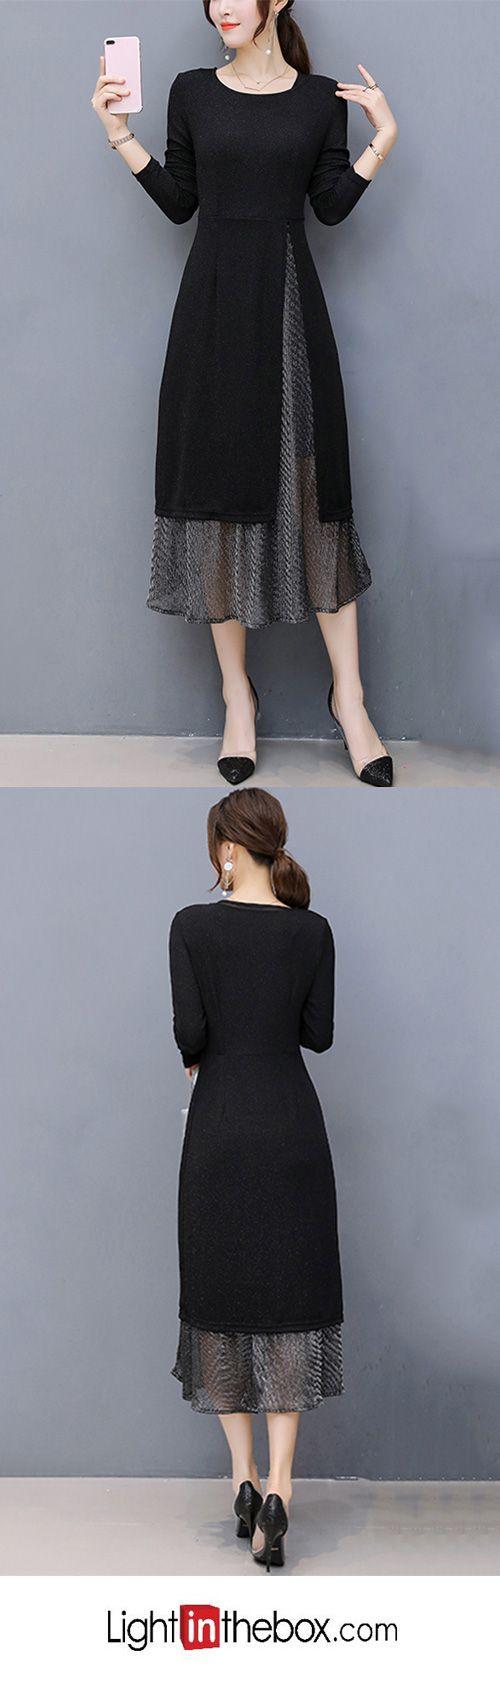 Plus Size Going Out Sheath Dress Patchwork Black Patchwork Fall Black Xl Xxl Xxxl Paltar Elbise Modelleri Buyuk Beden Kiyafetler Ve Kiyafet